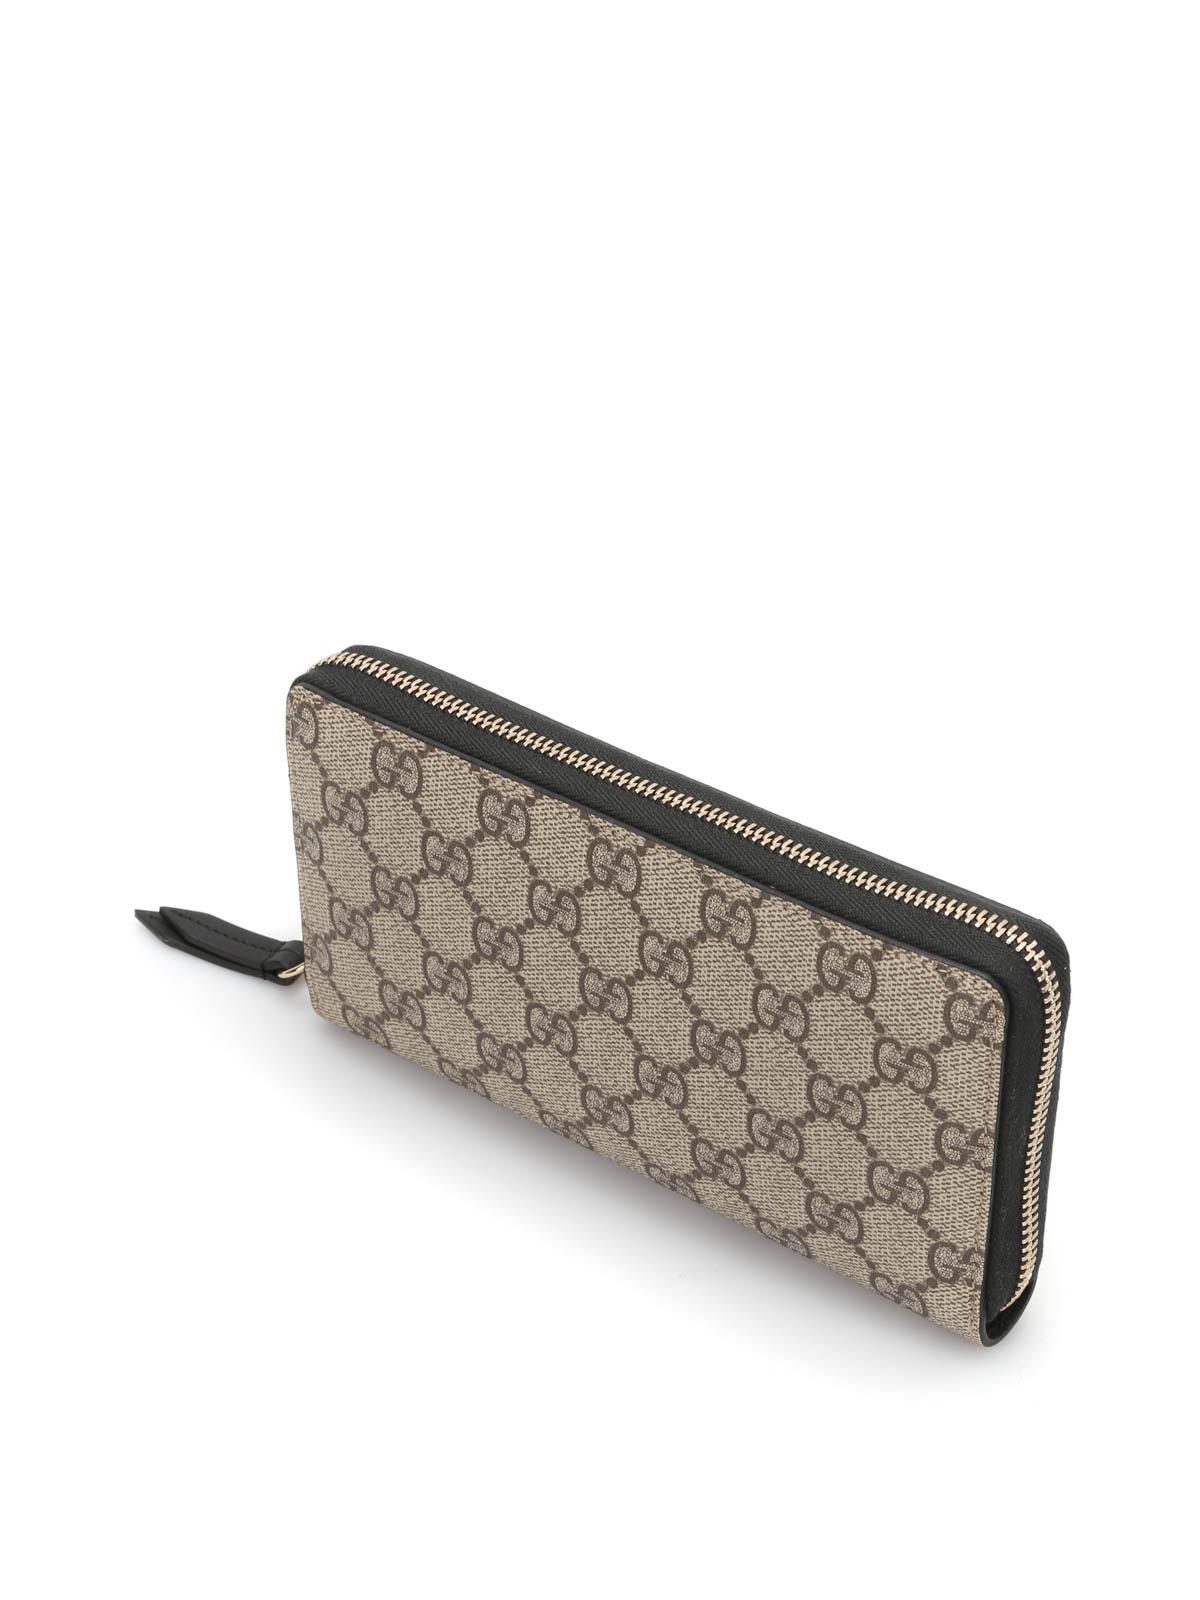 0274f053717 Gucci - GG Supreme zip- around wallet - wallets   purses - 410102 ...